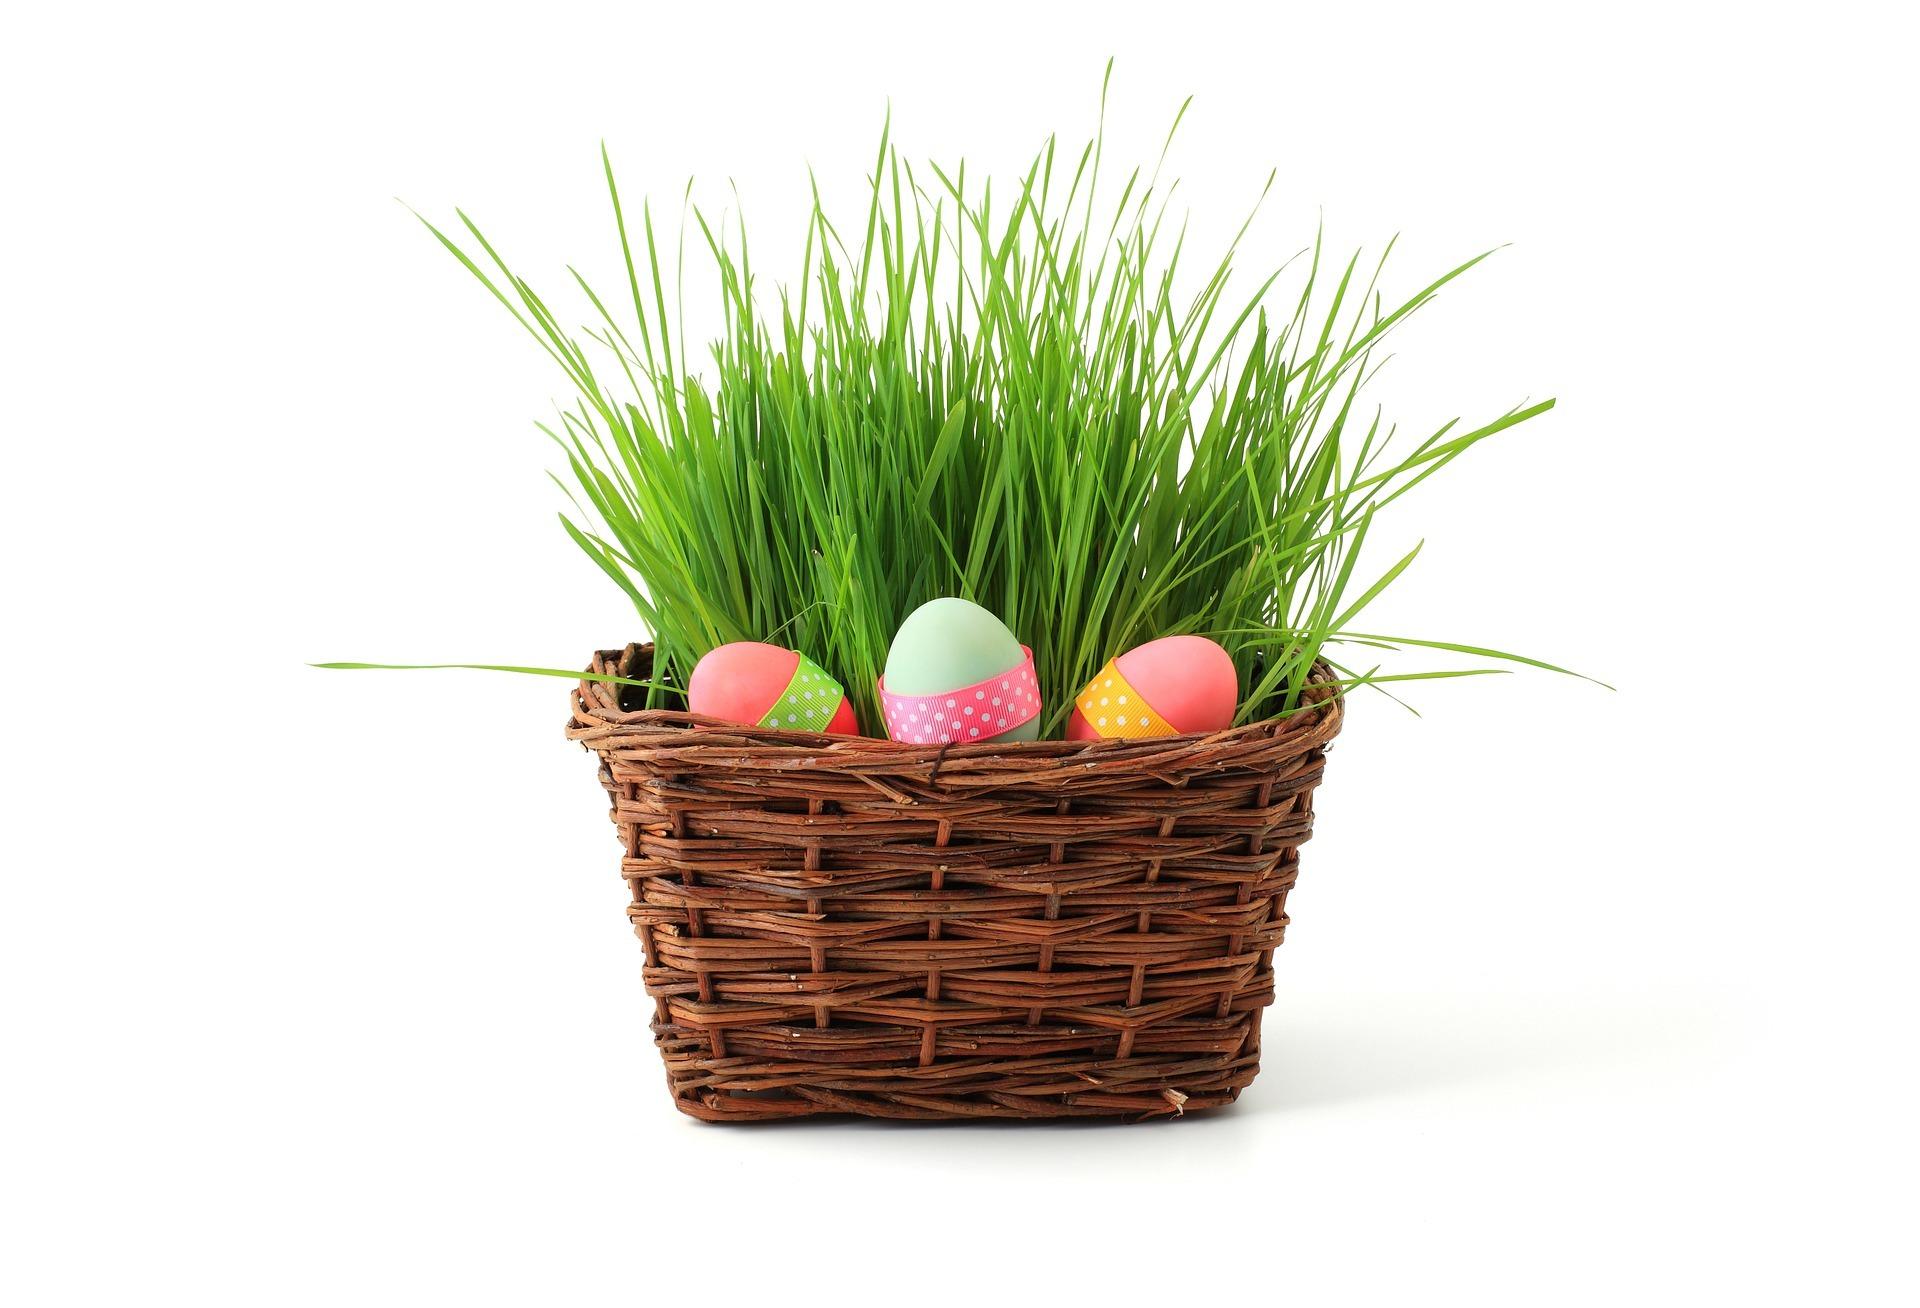 Easter basket filler ideas kendranicole easter basket filler ideas negle Choice Image